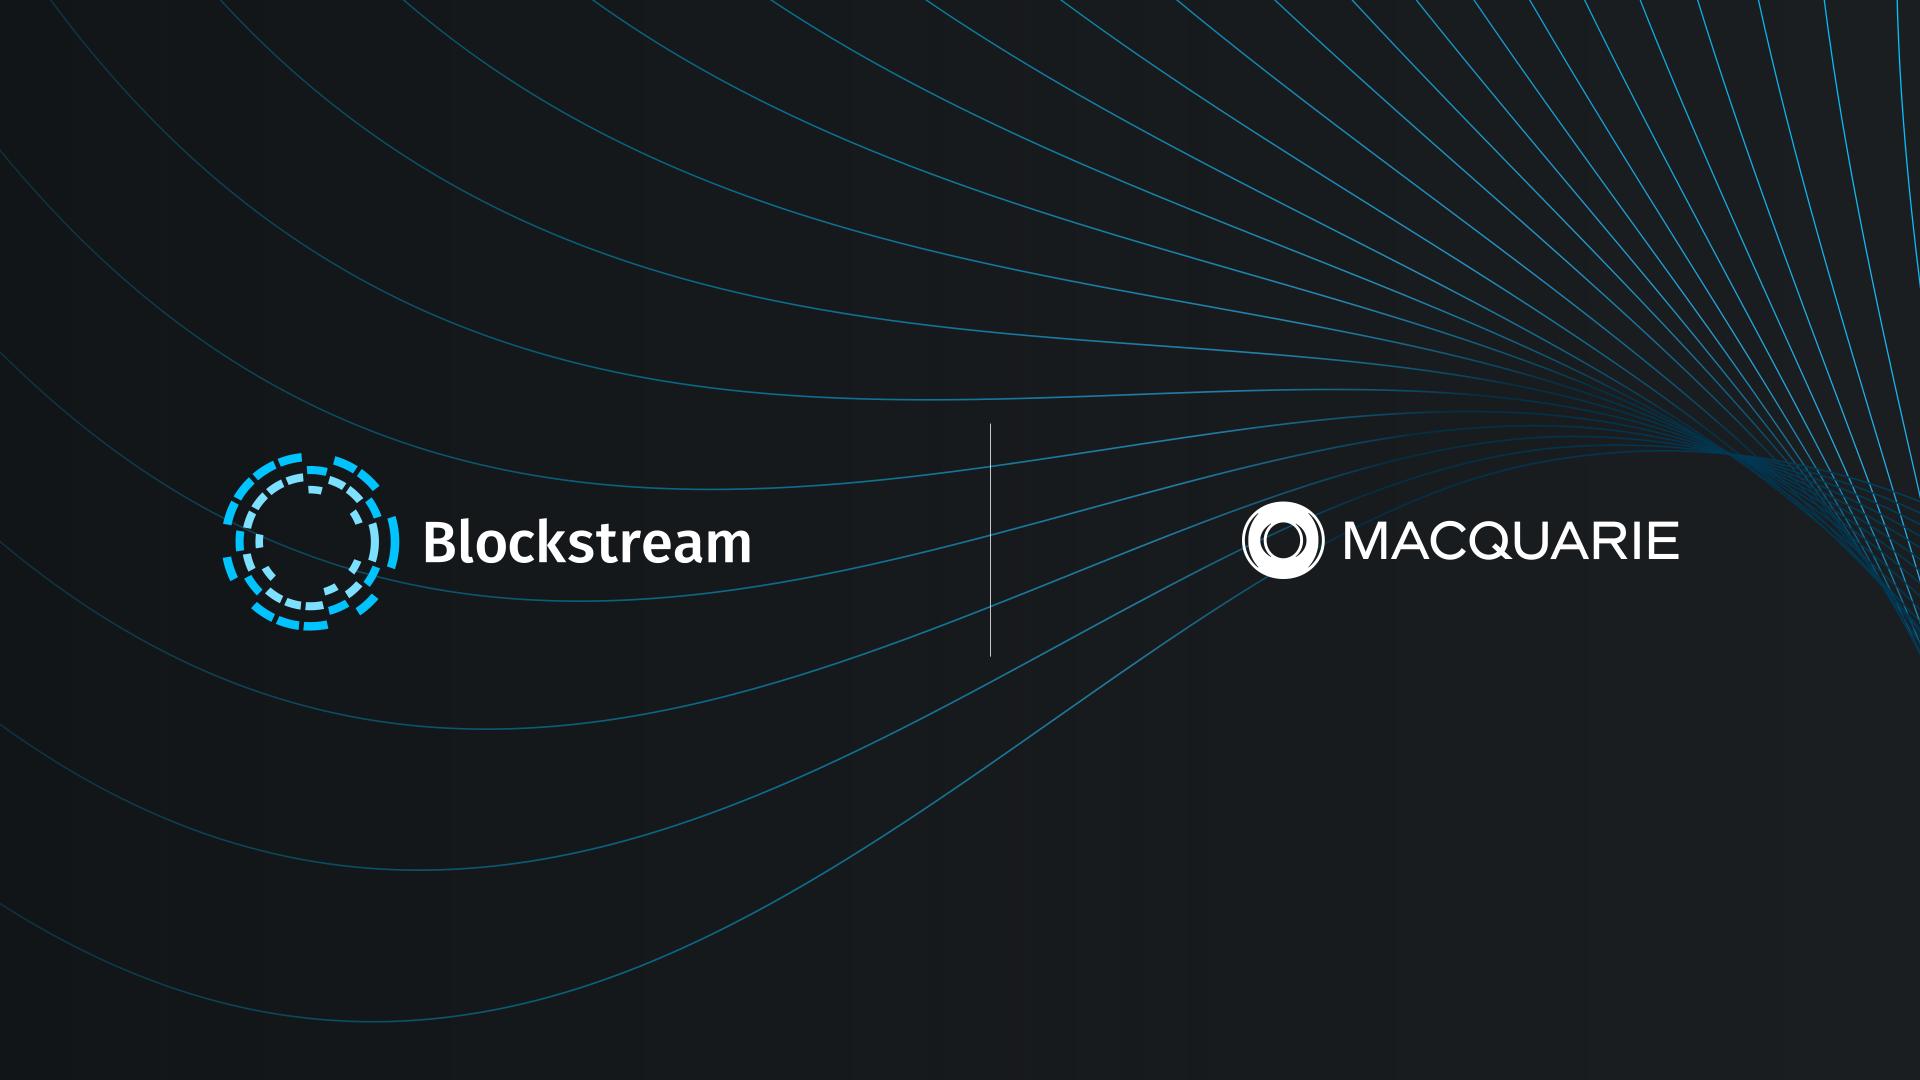 Blockstream and Macquarie to Form Green Bitcoin Mining Partnership